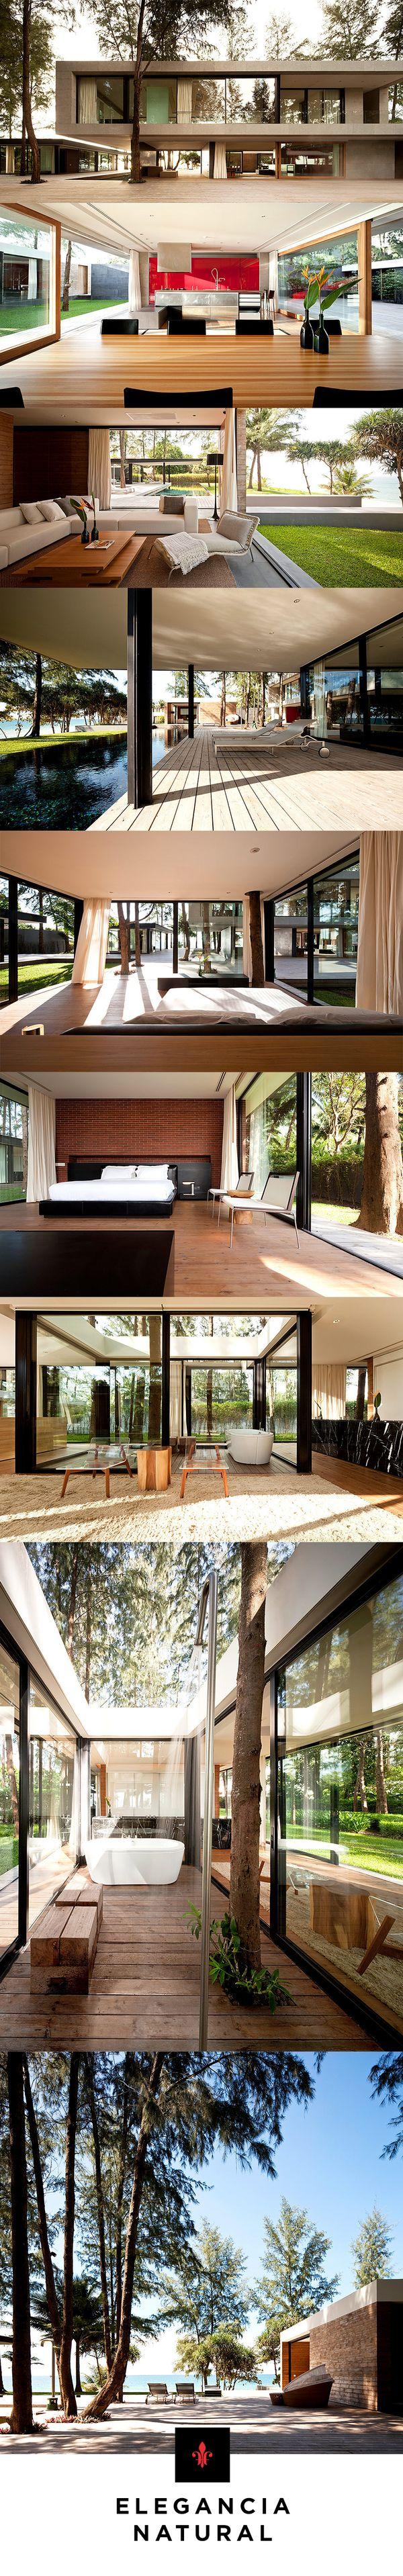 Casa vacacional en Phuket, Thailandia | Modernidad de alto confort